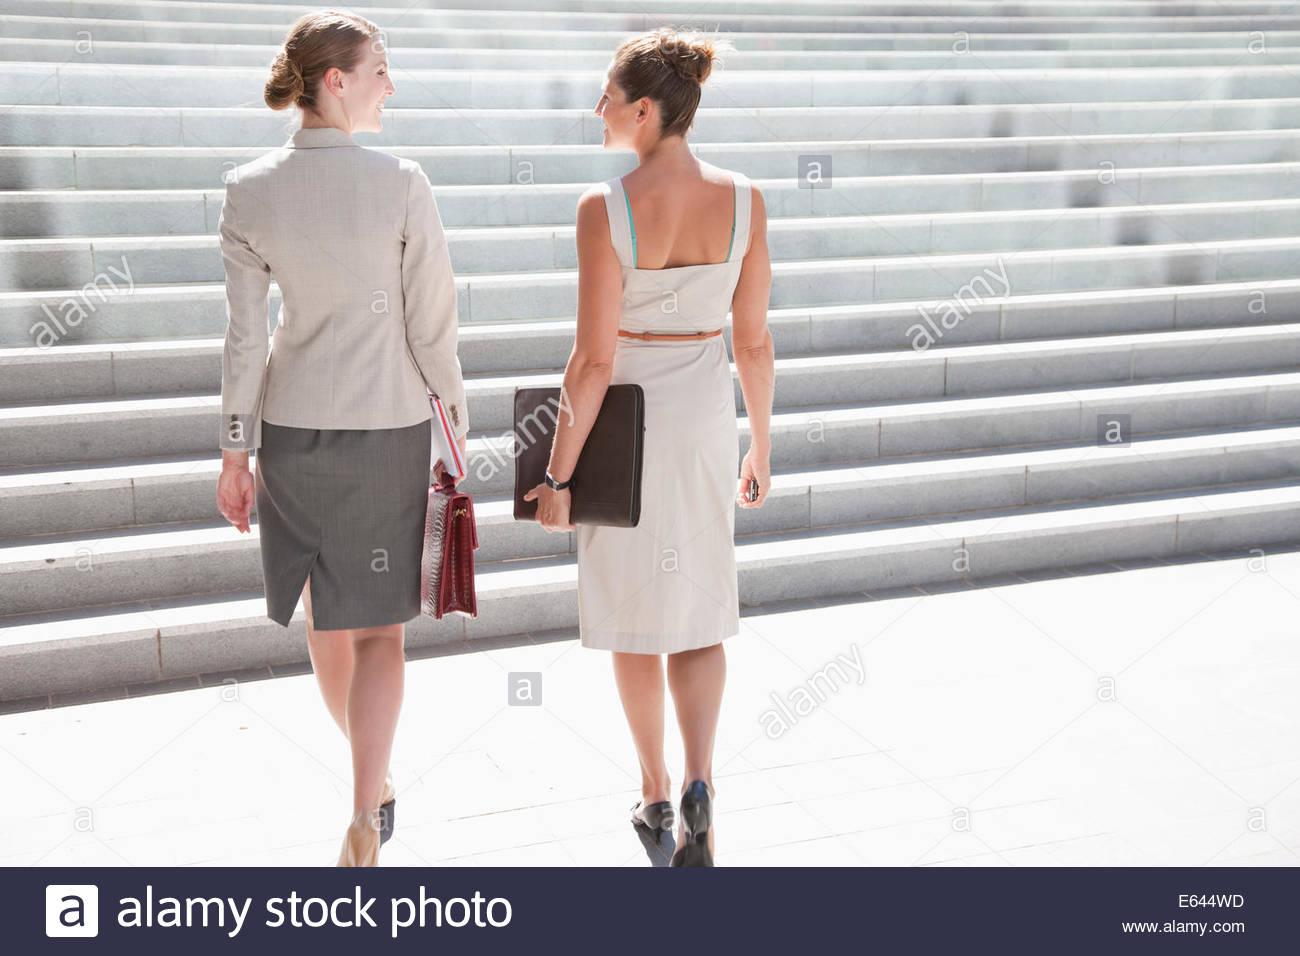 Businesswomen walking up steps outdoors - Stock Image